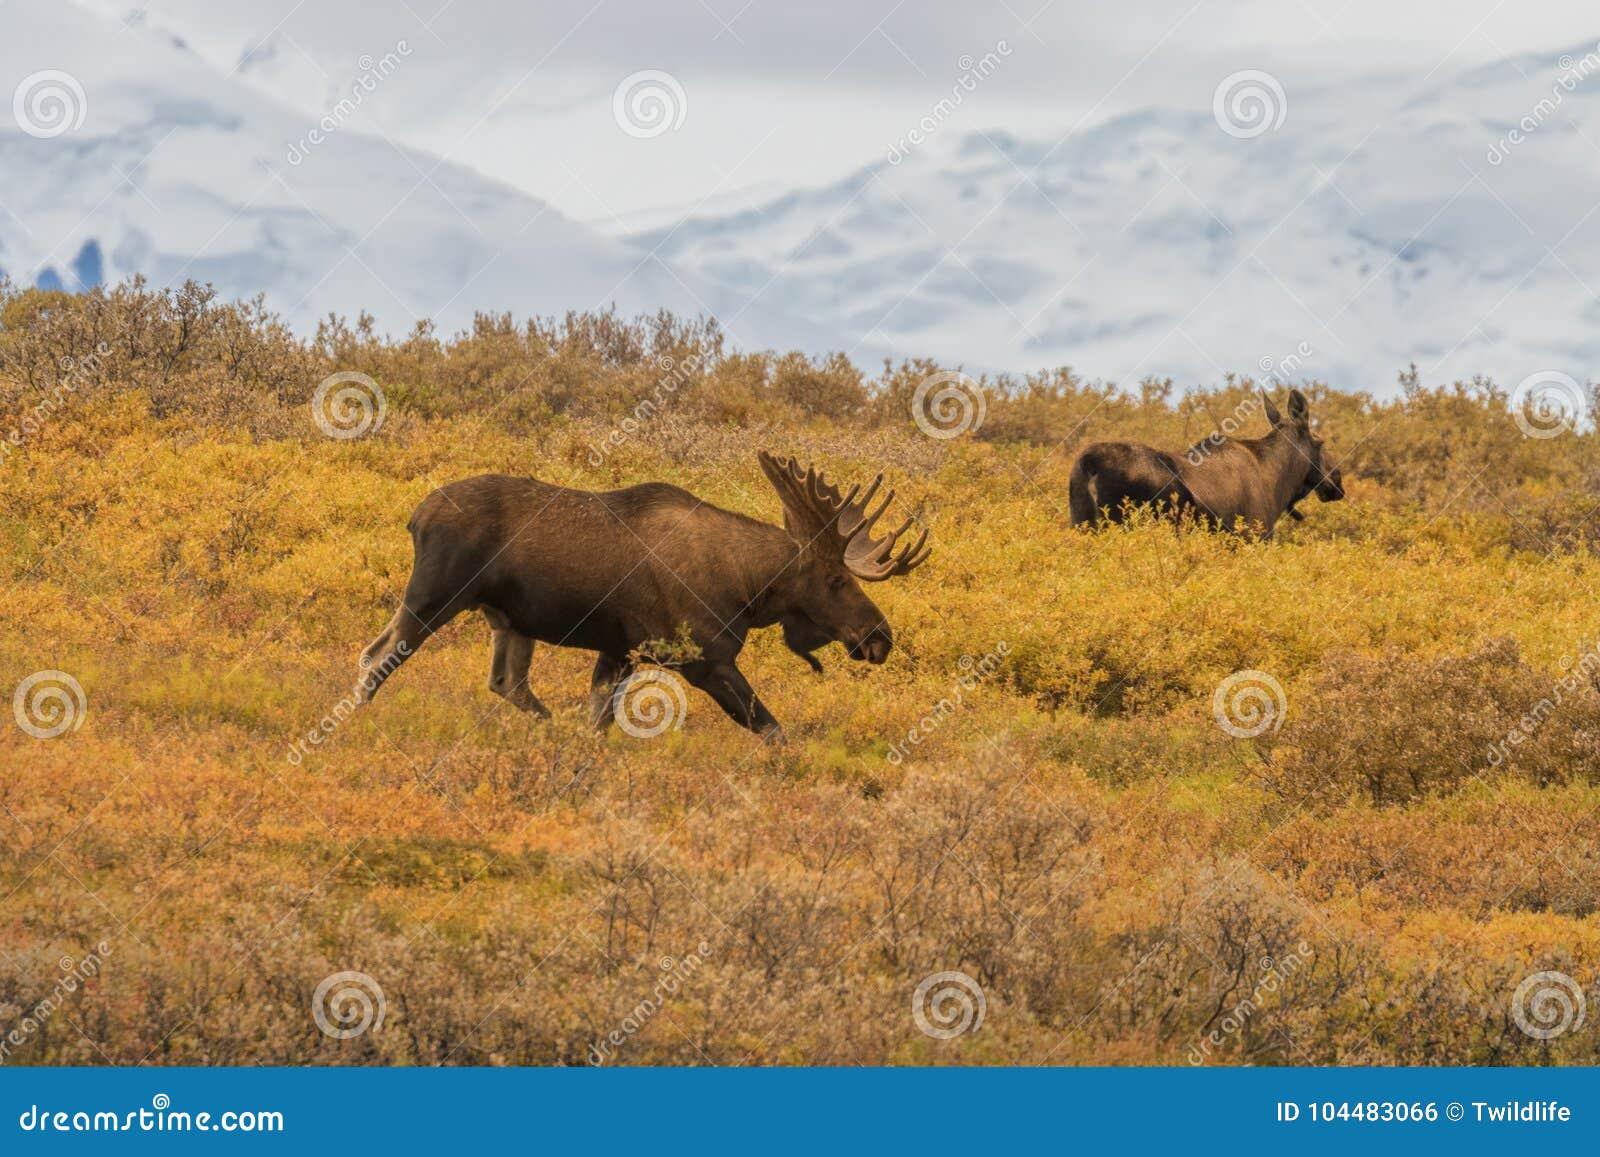 Bull and Cow Alaska Yukon Moose